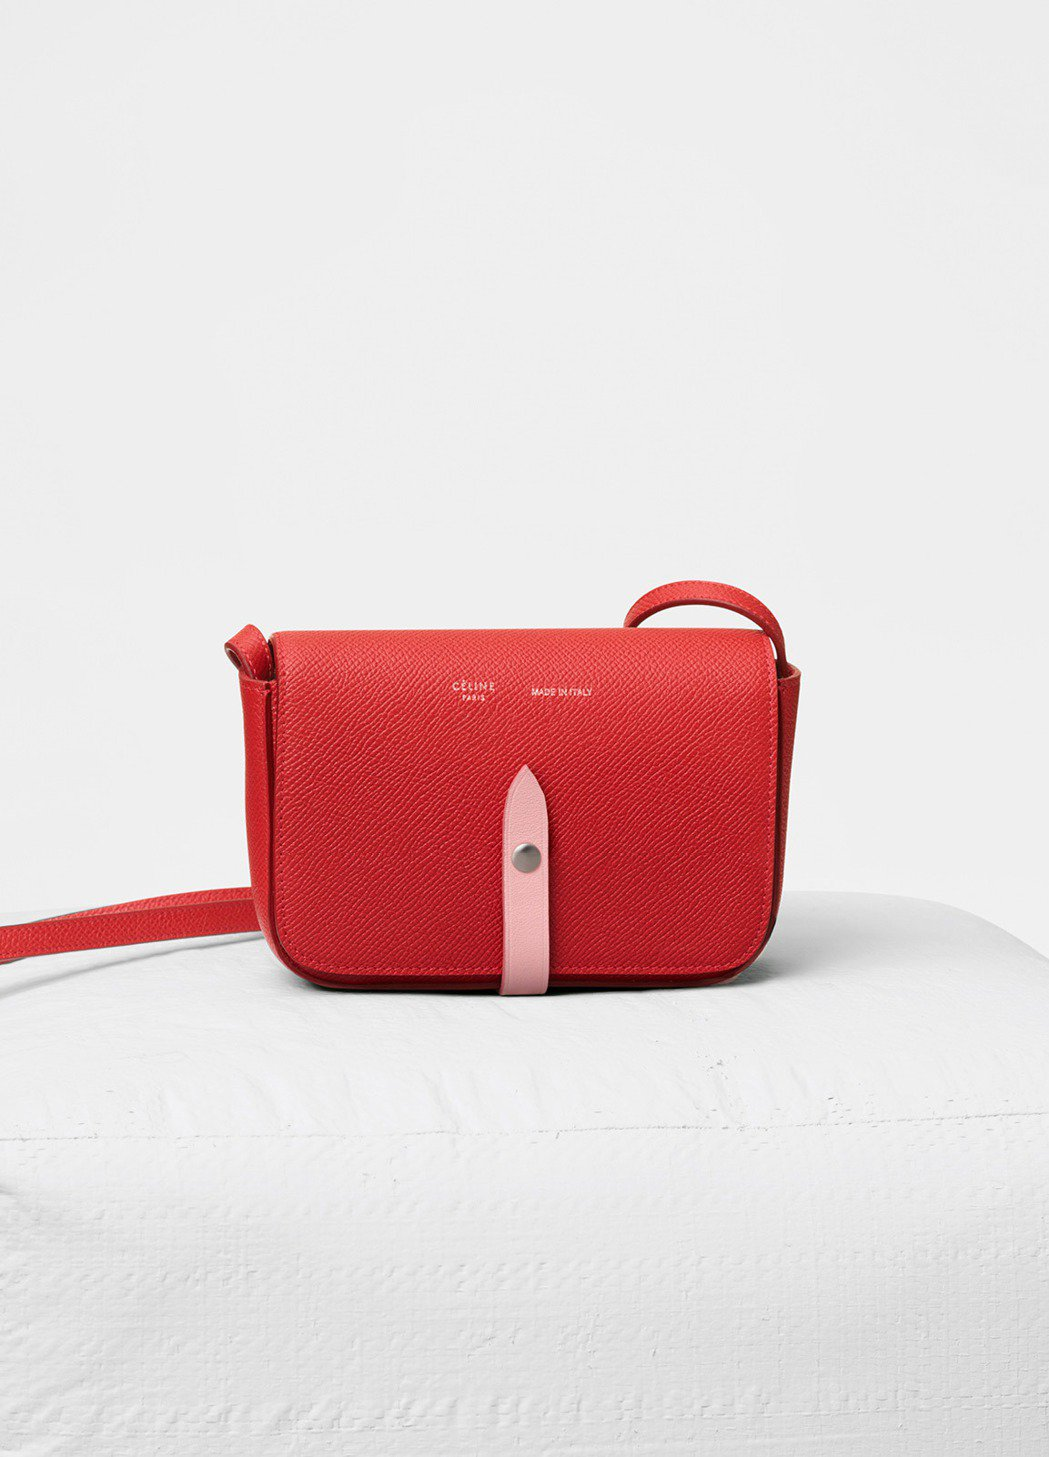 Strap亮紅色小牛皮肩背手拿包,售價22,500元。圖/CÉLINE提供